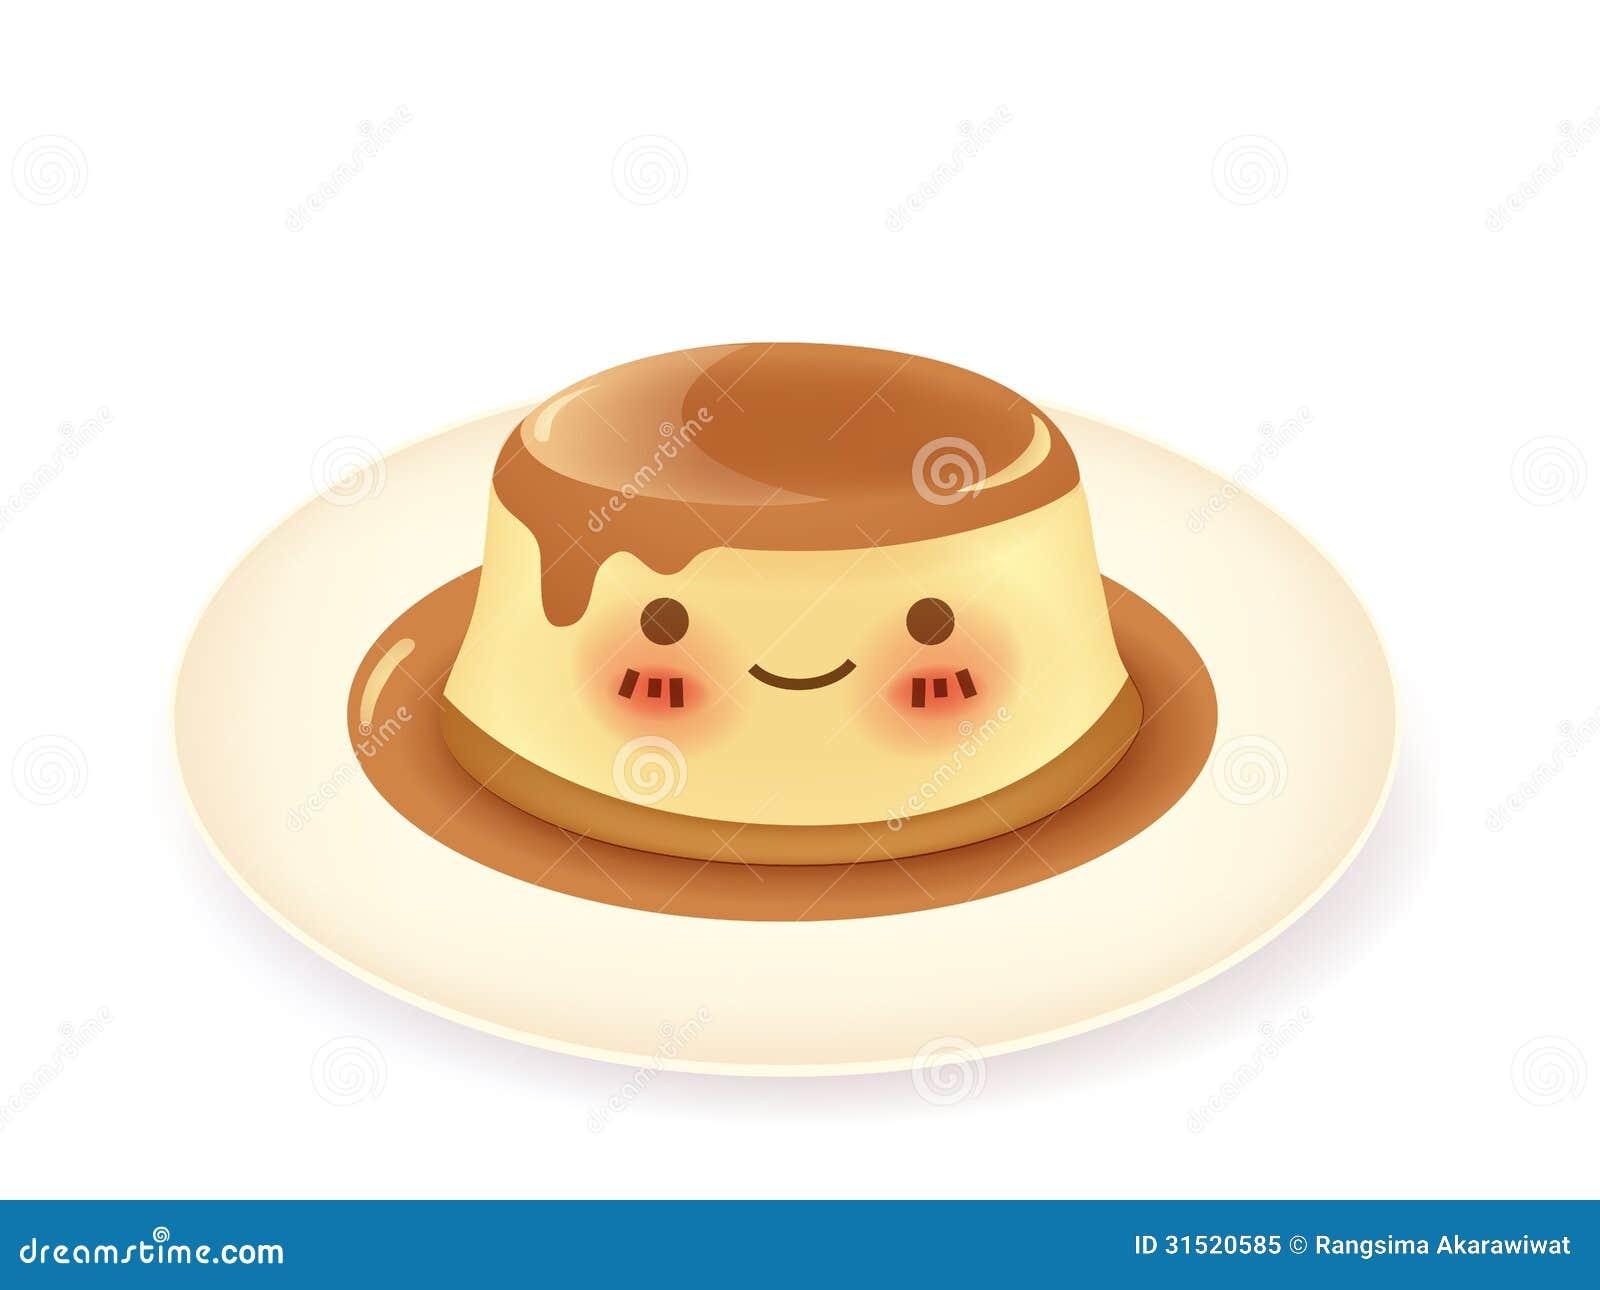 Royalty Free Stock Photo Caramel Custard Pudding